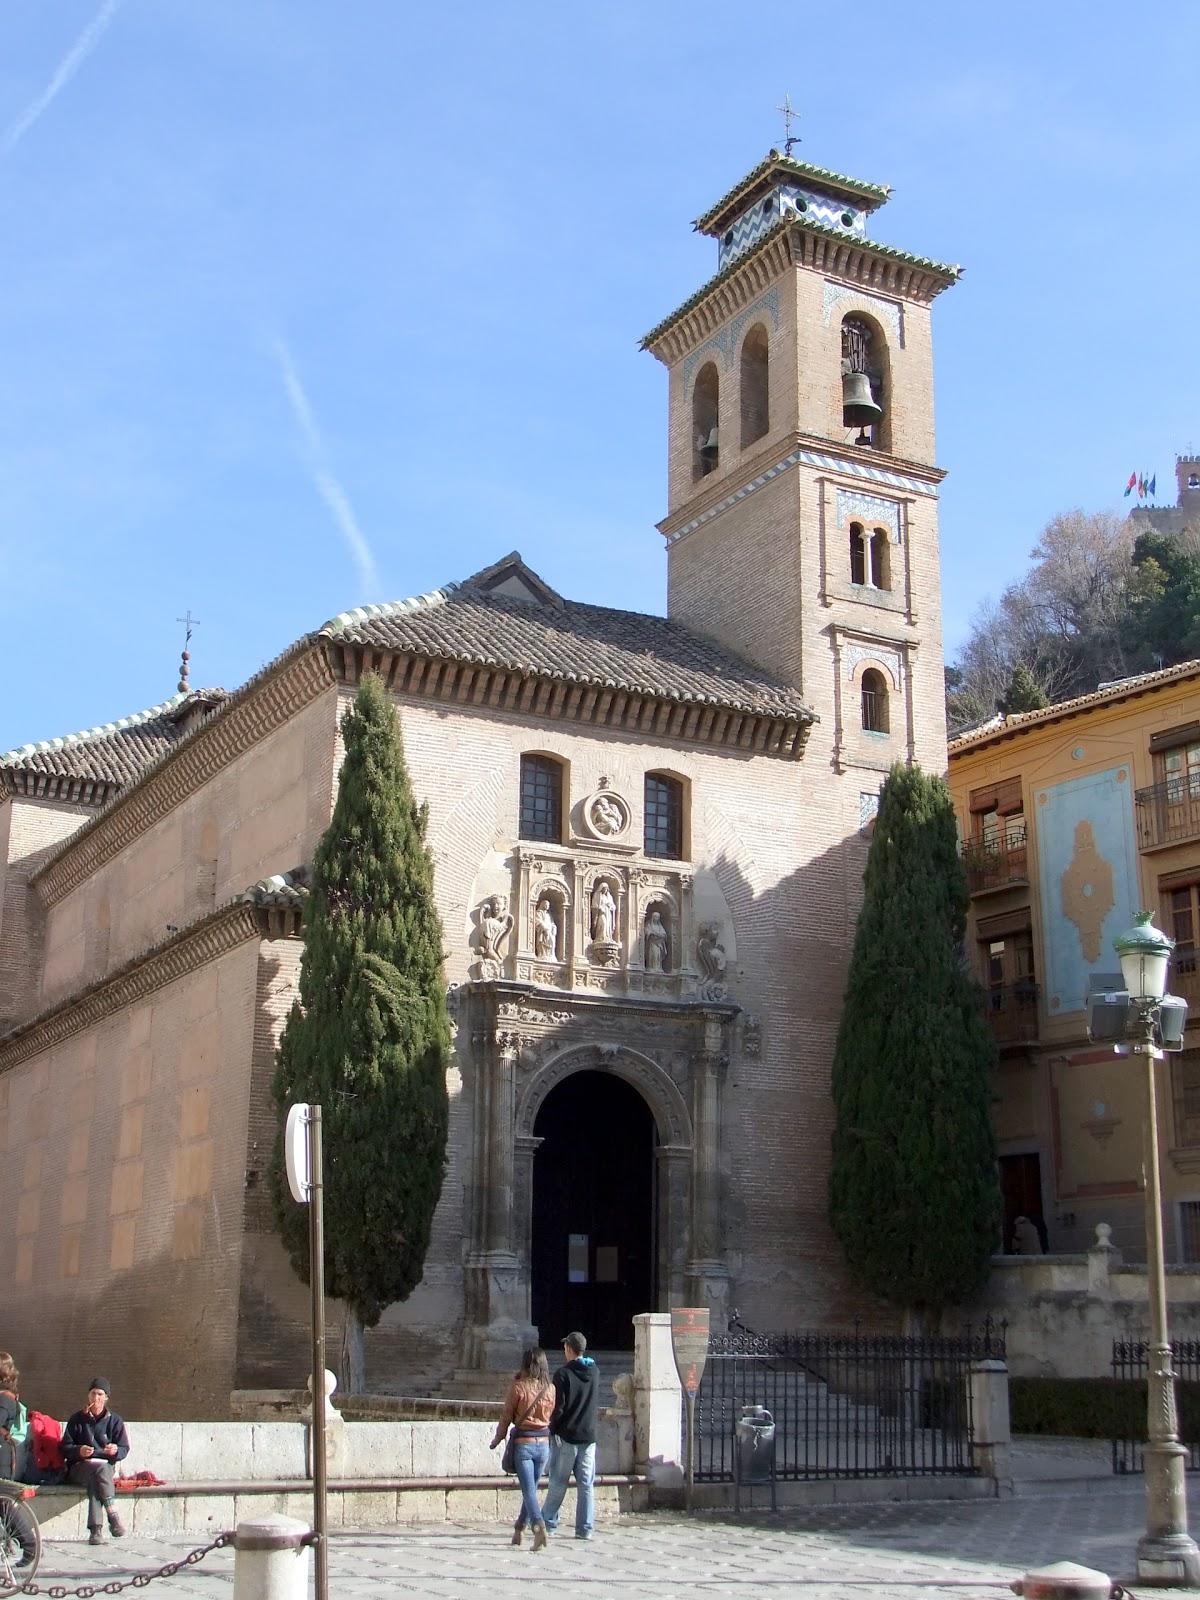 Postcards from spain granada iglesia de santa ana y san gil - Santa ana granada ...